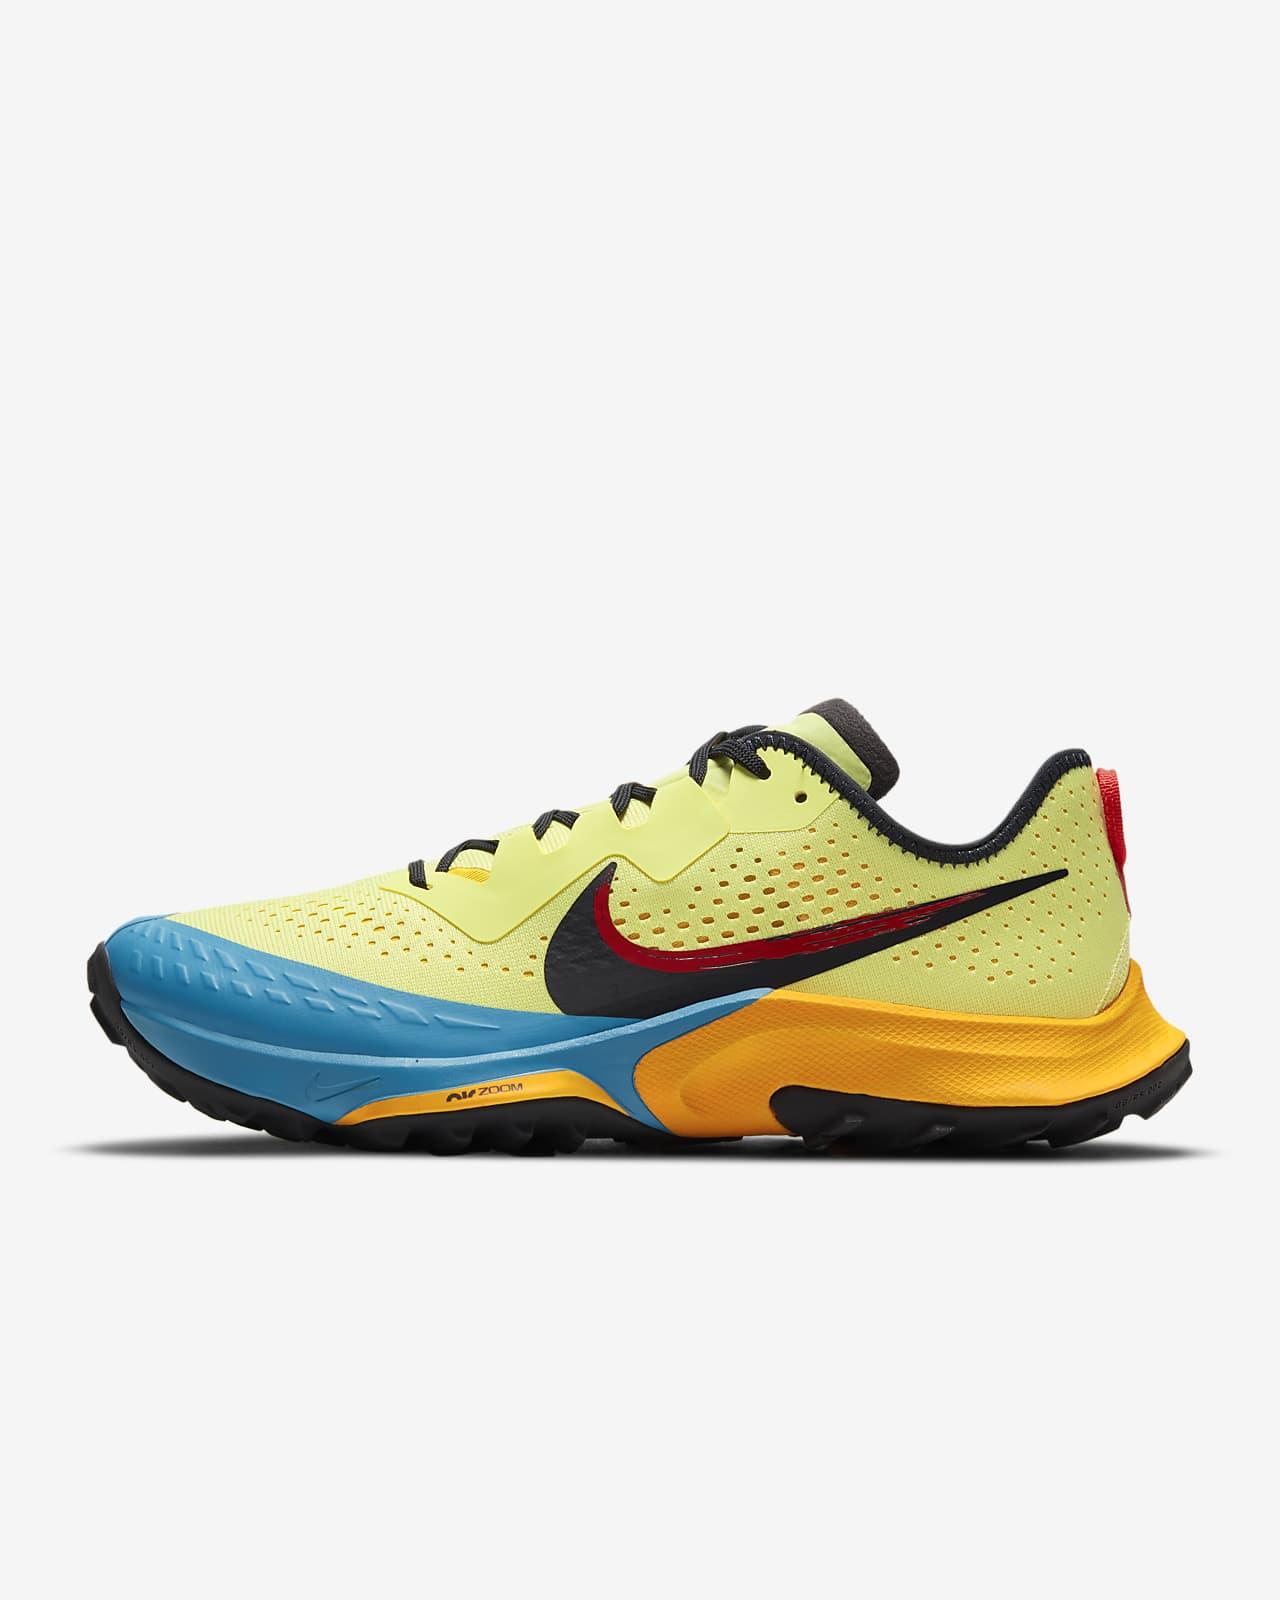 Scarpa da trail running Nike Air Zoom Terra Kiger 7 - Uomo